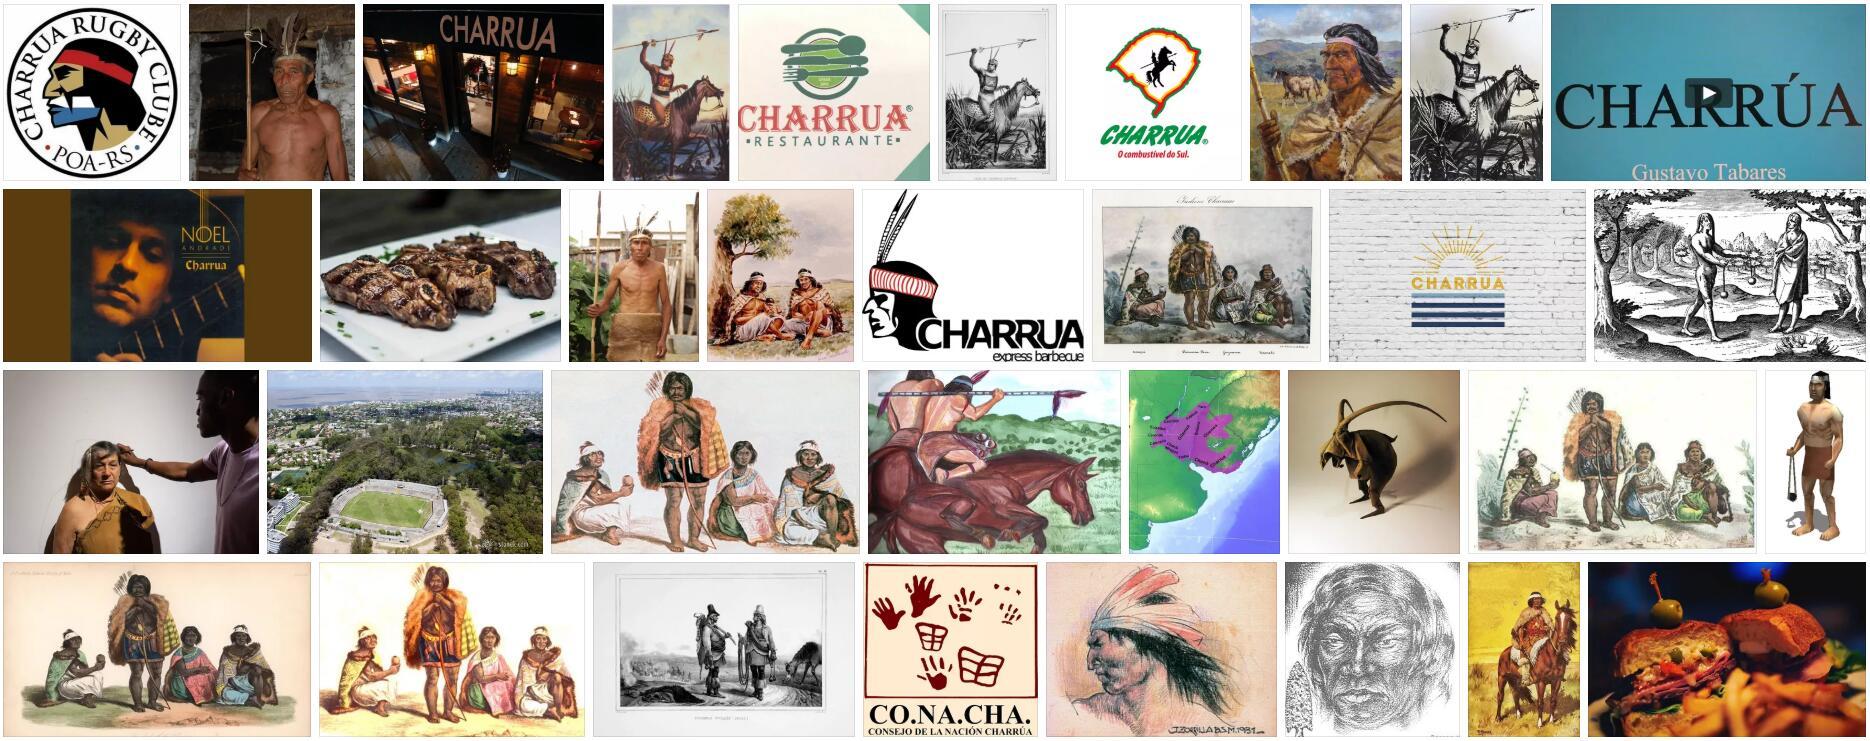 What is Charrúa